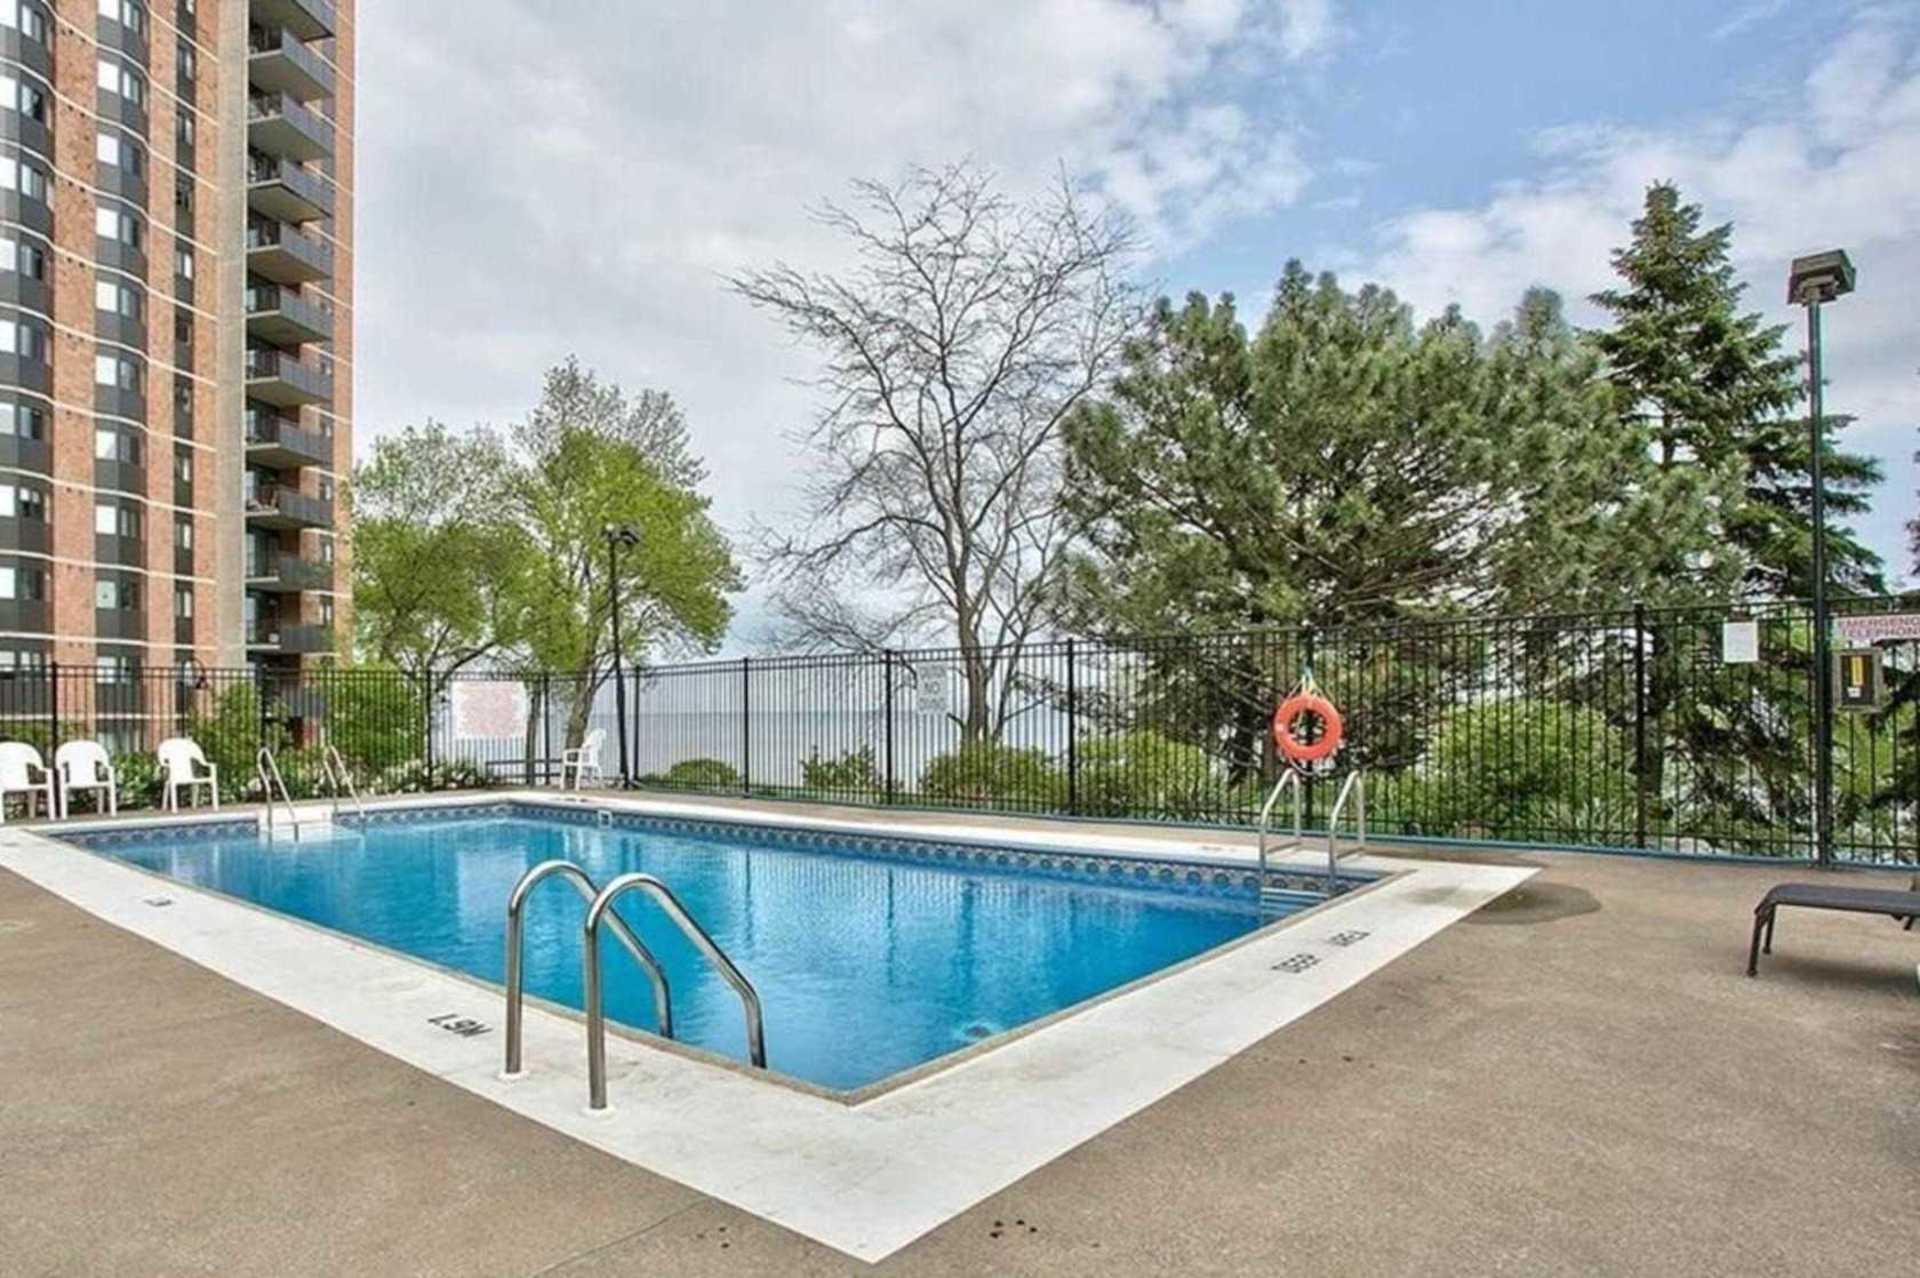 Outdoor Pool at 1809 - 5250 Lakeshore Road, Appleby, Burlington